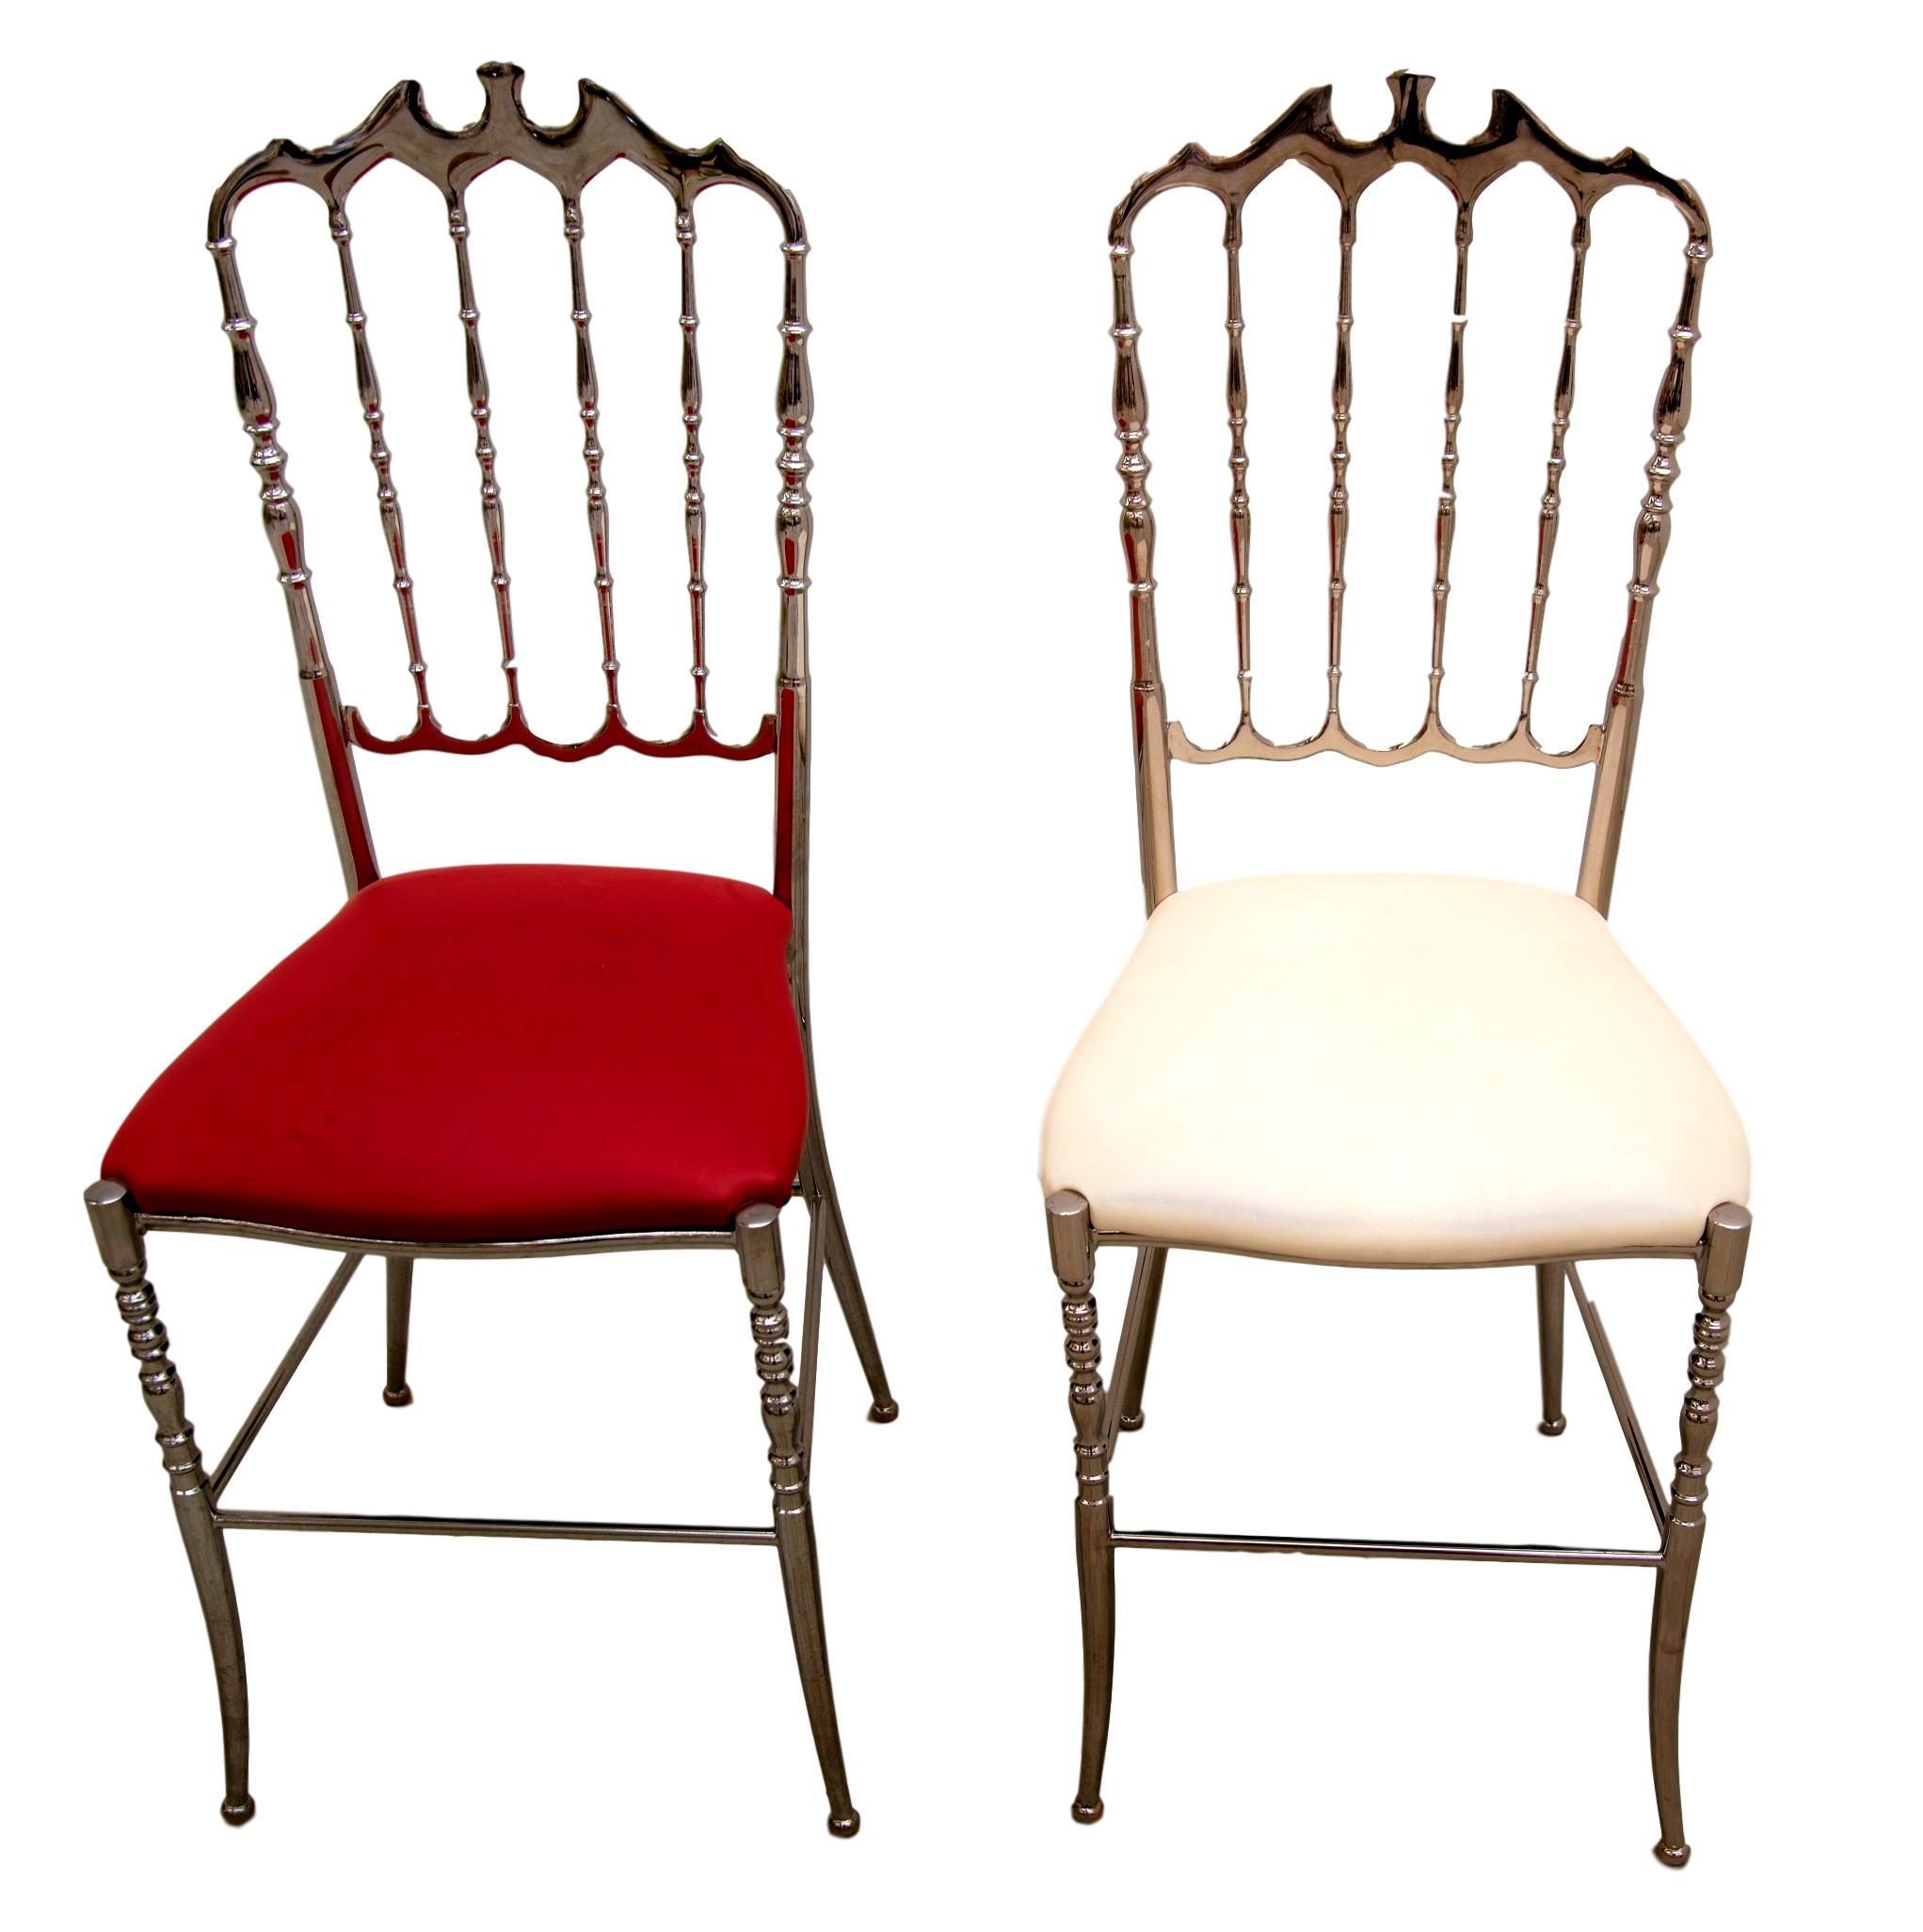 Pair of 1970s Italian Metal Silver Chiavari Chairs